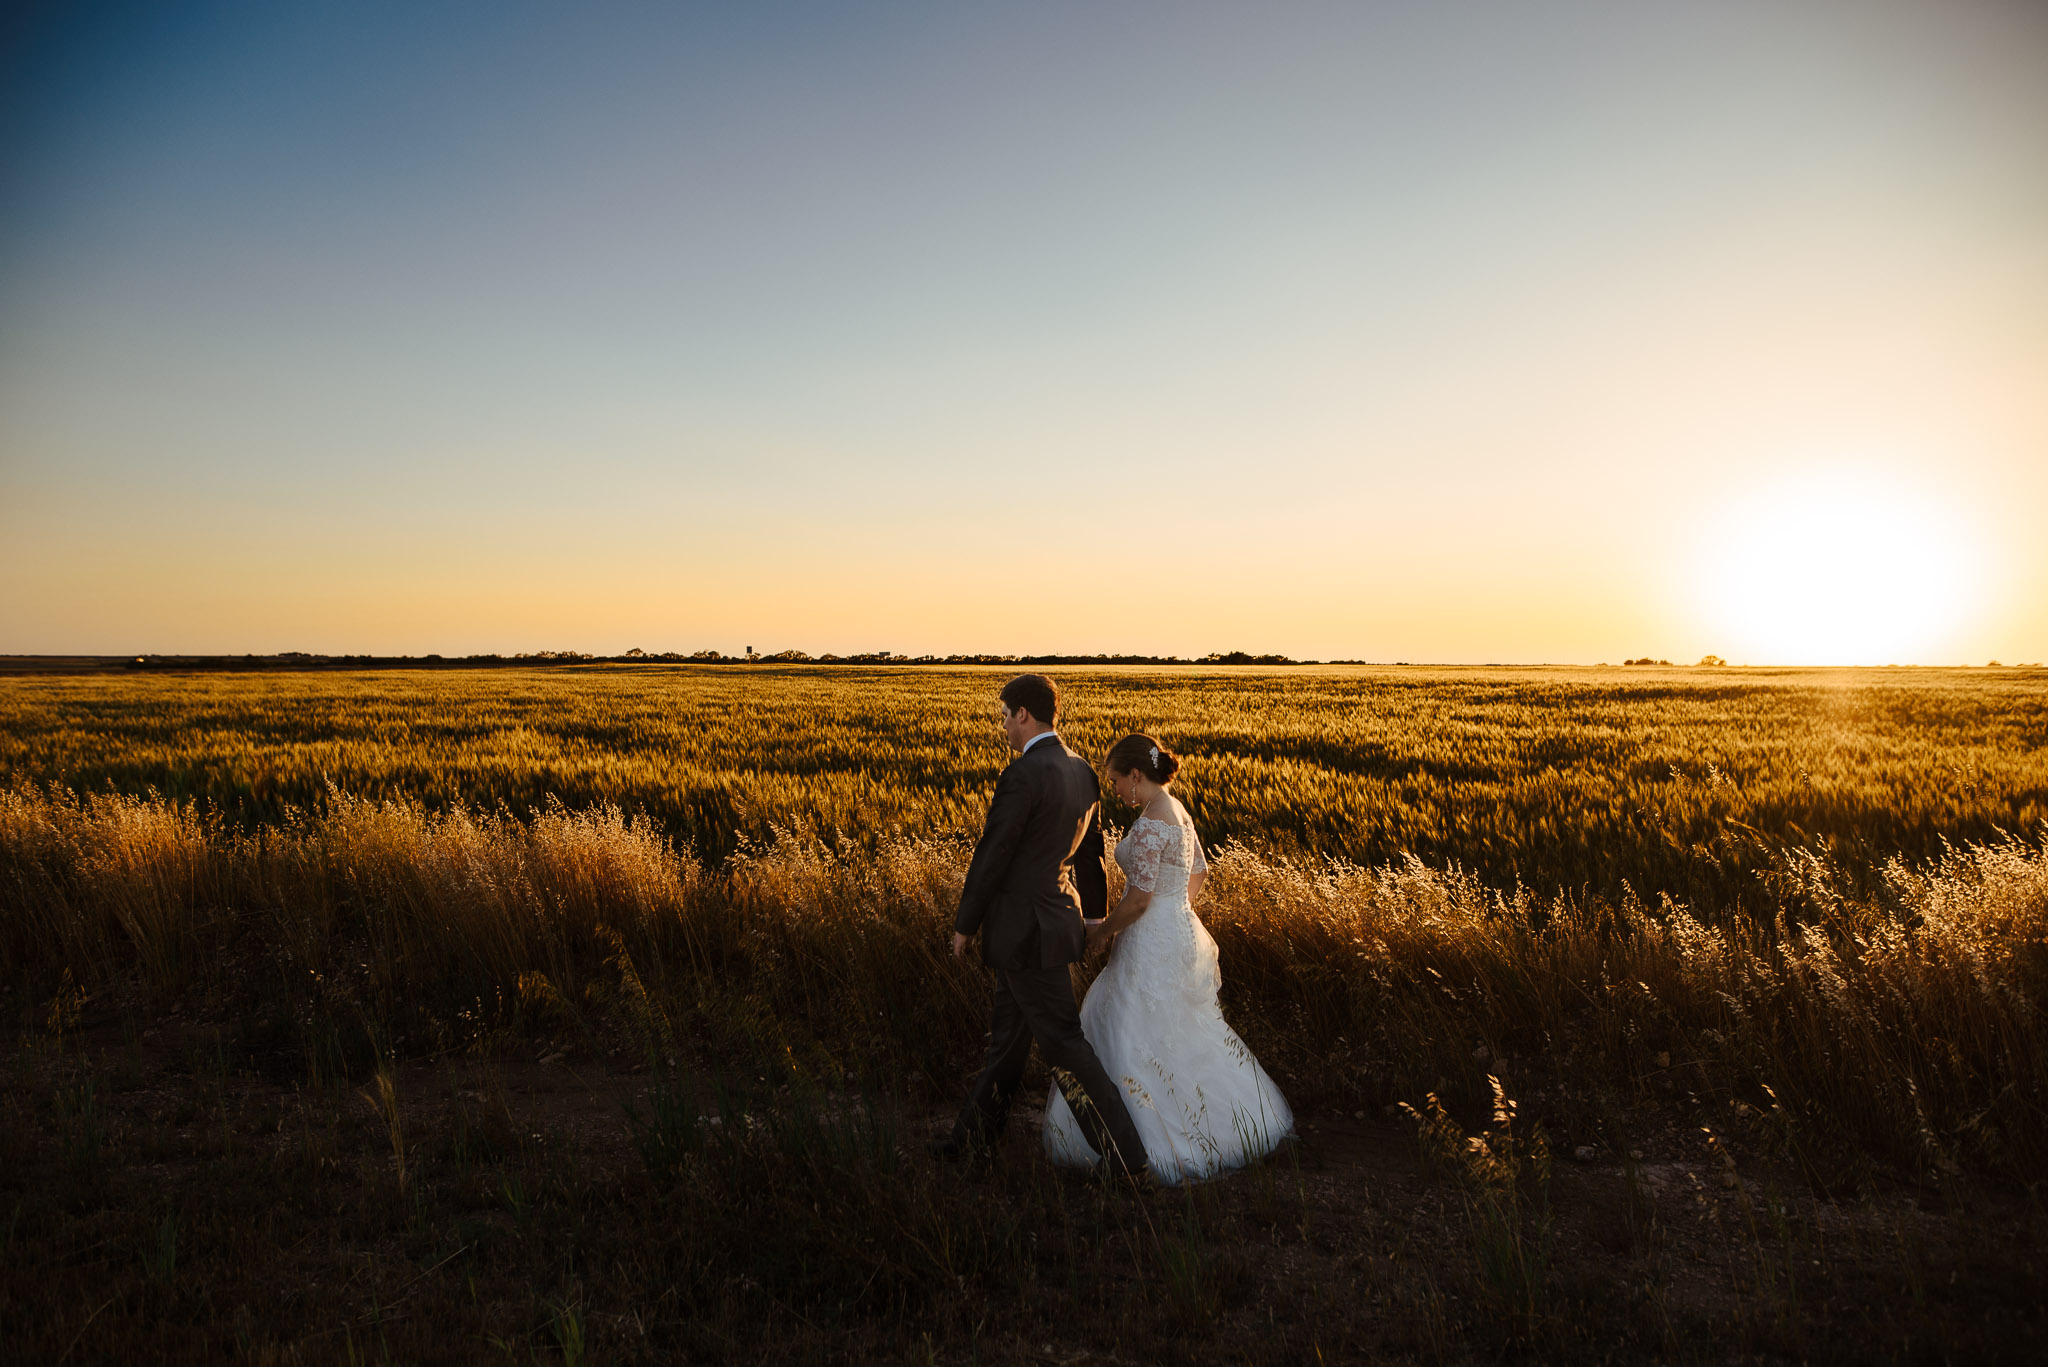 West-Texas-Wedding-Photographer-0021.jpg